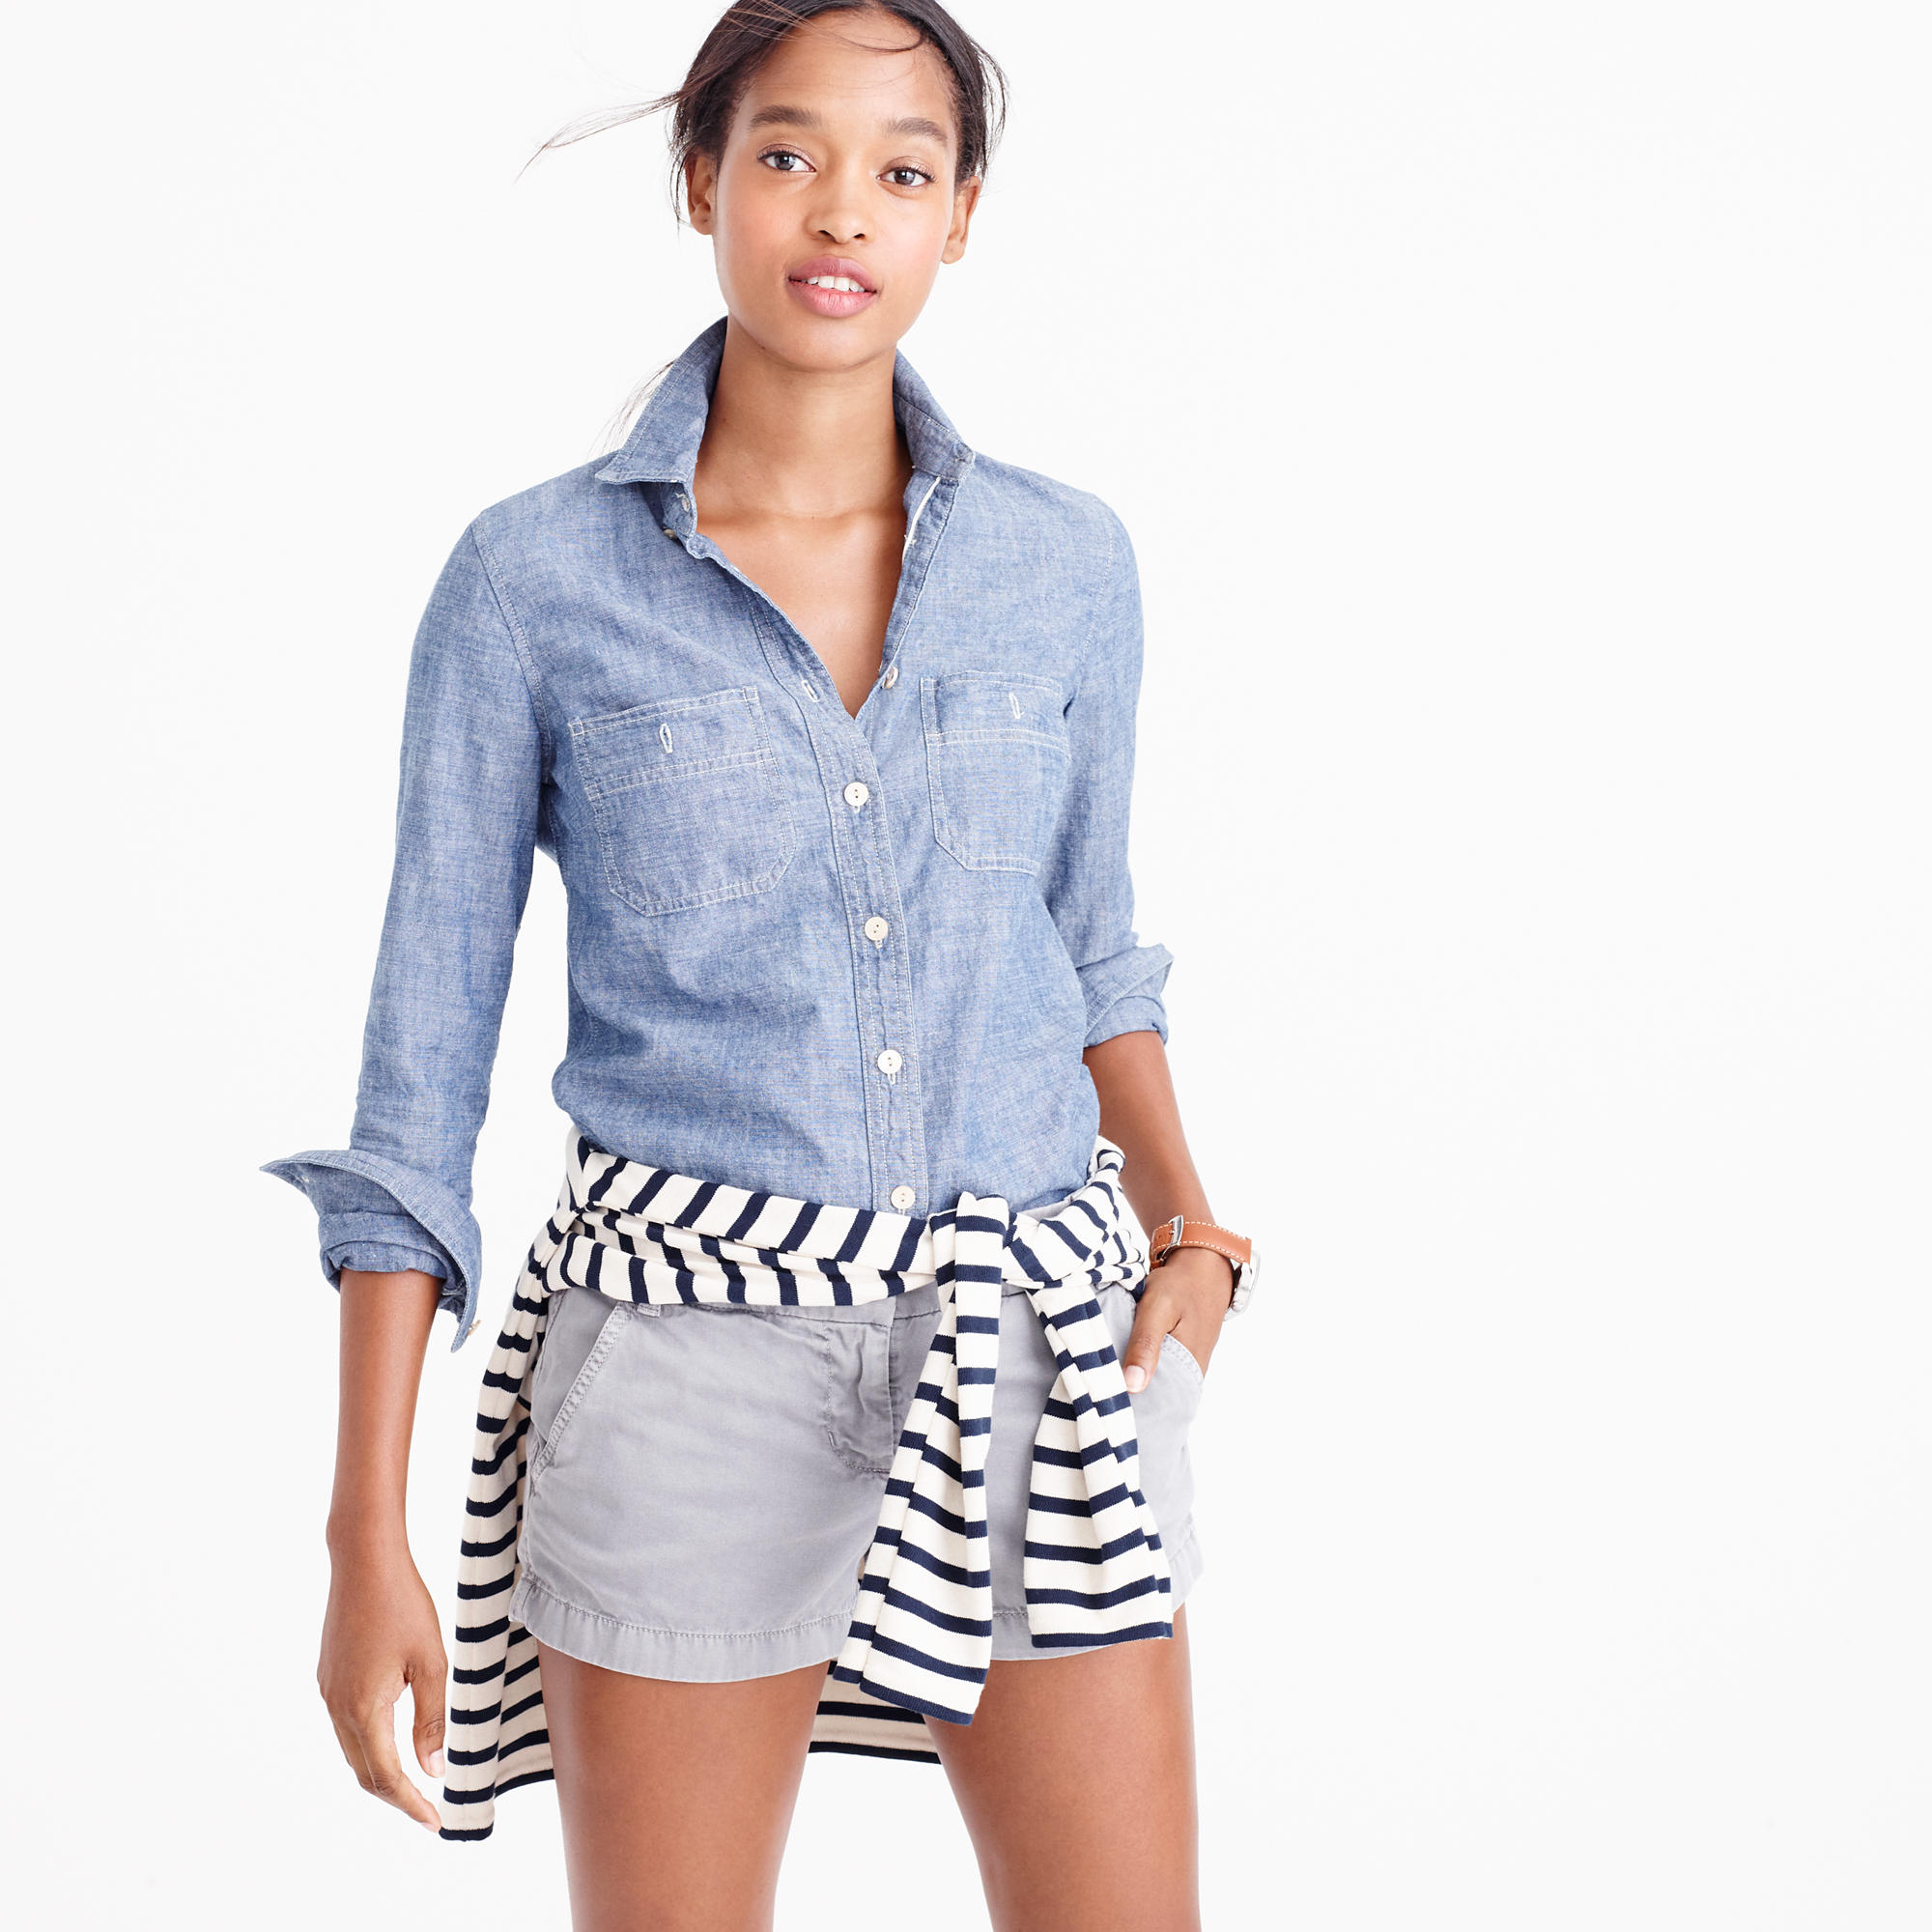 3&quot Chino Short : Women&39s Shorts  J.Crew